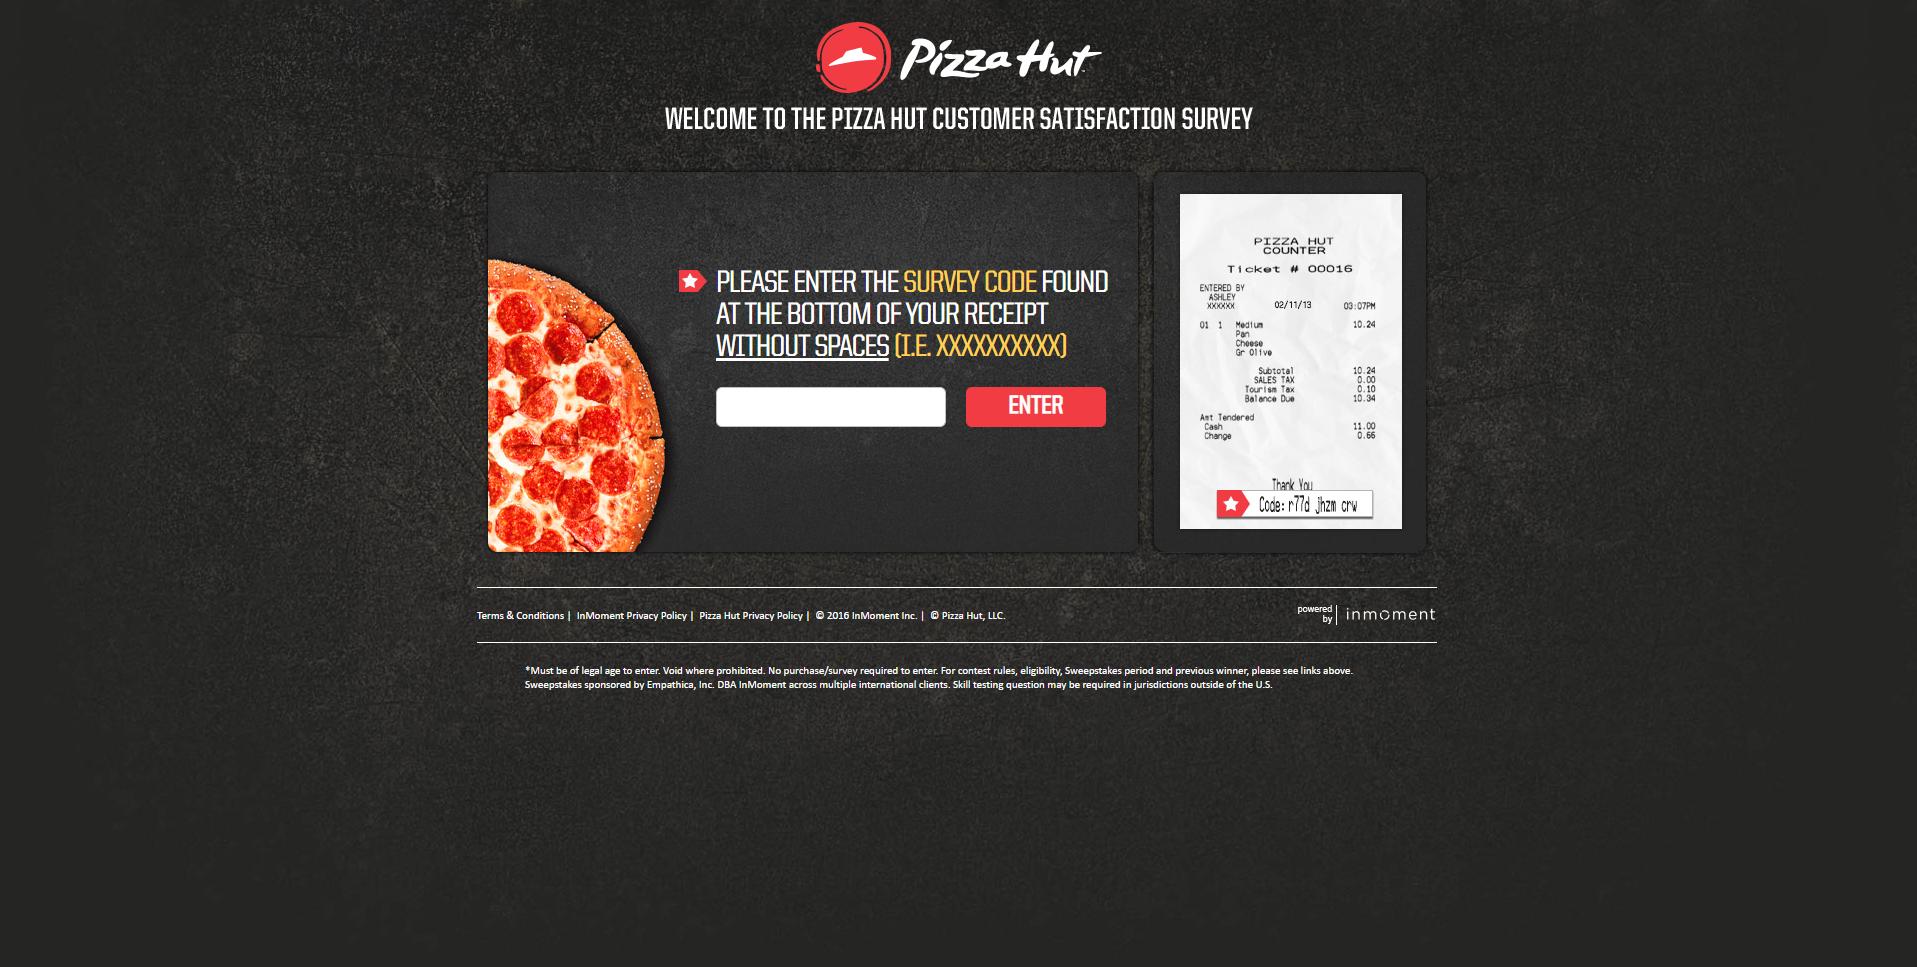 www.TellPizzaHut.com